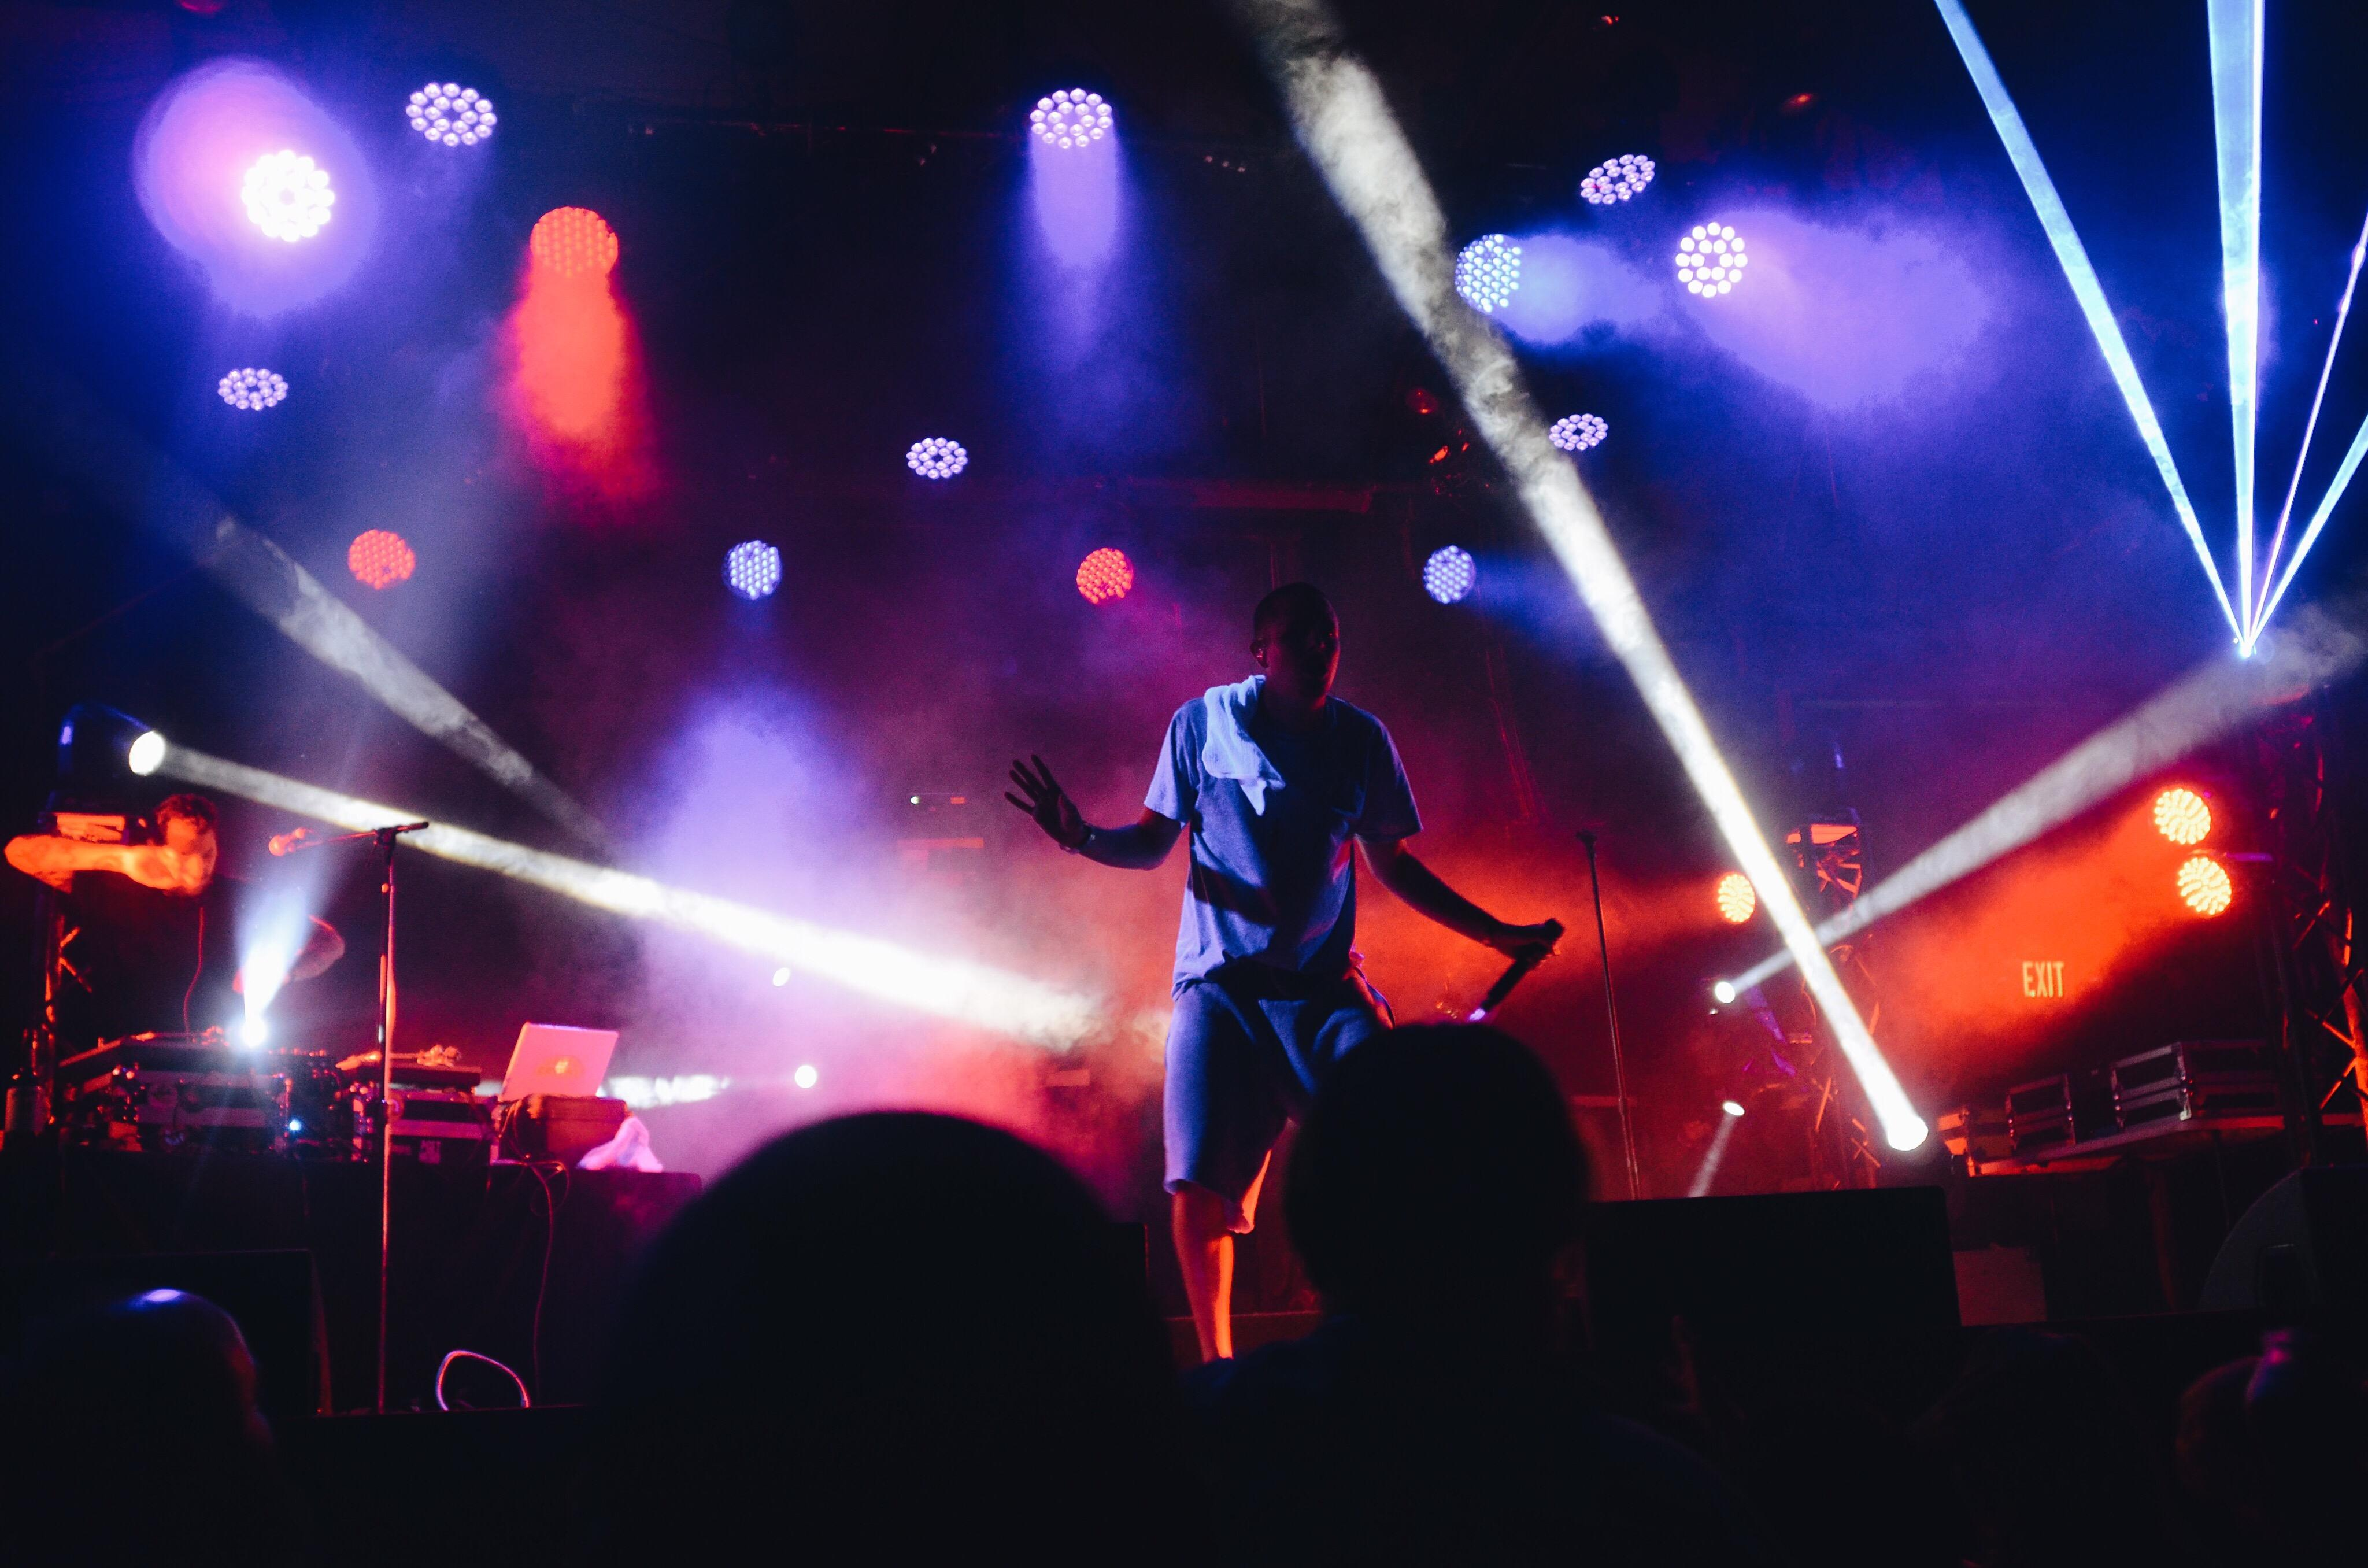 20th Annual San Francisco Electronic Music Festival